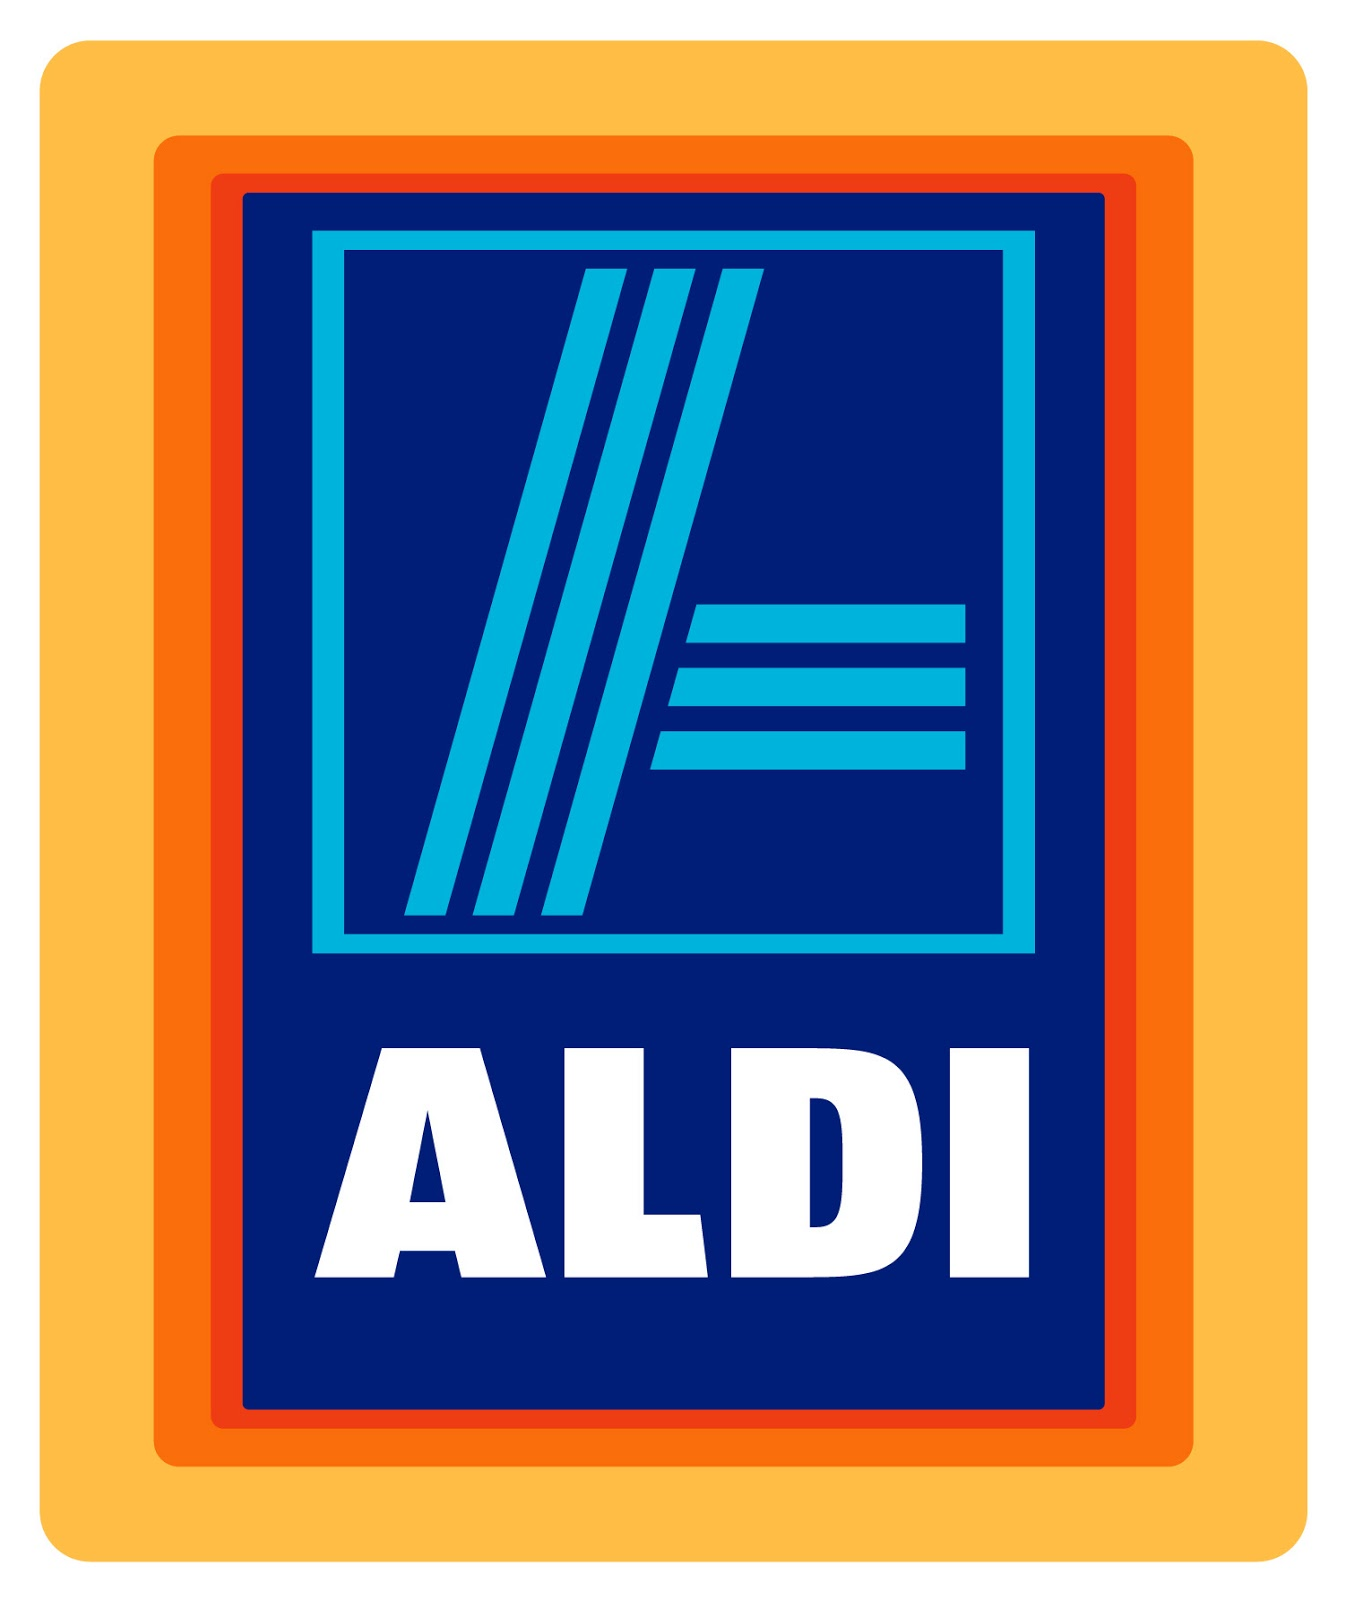 Aldi K Henmaschine Quigg 2015 : Aldi Nappy And Wet Wipes Review ...